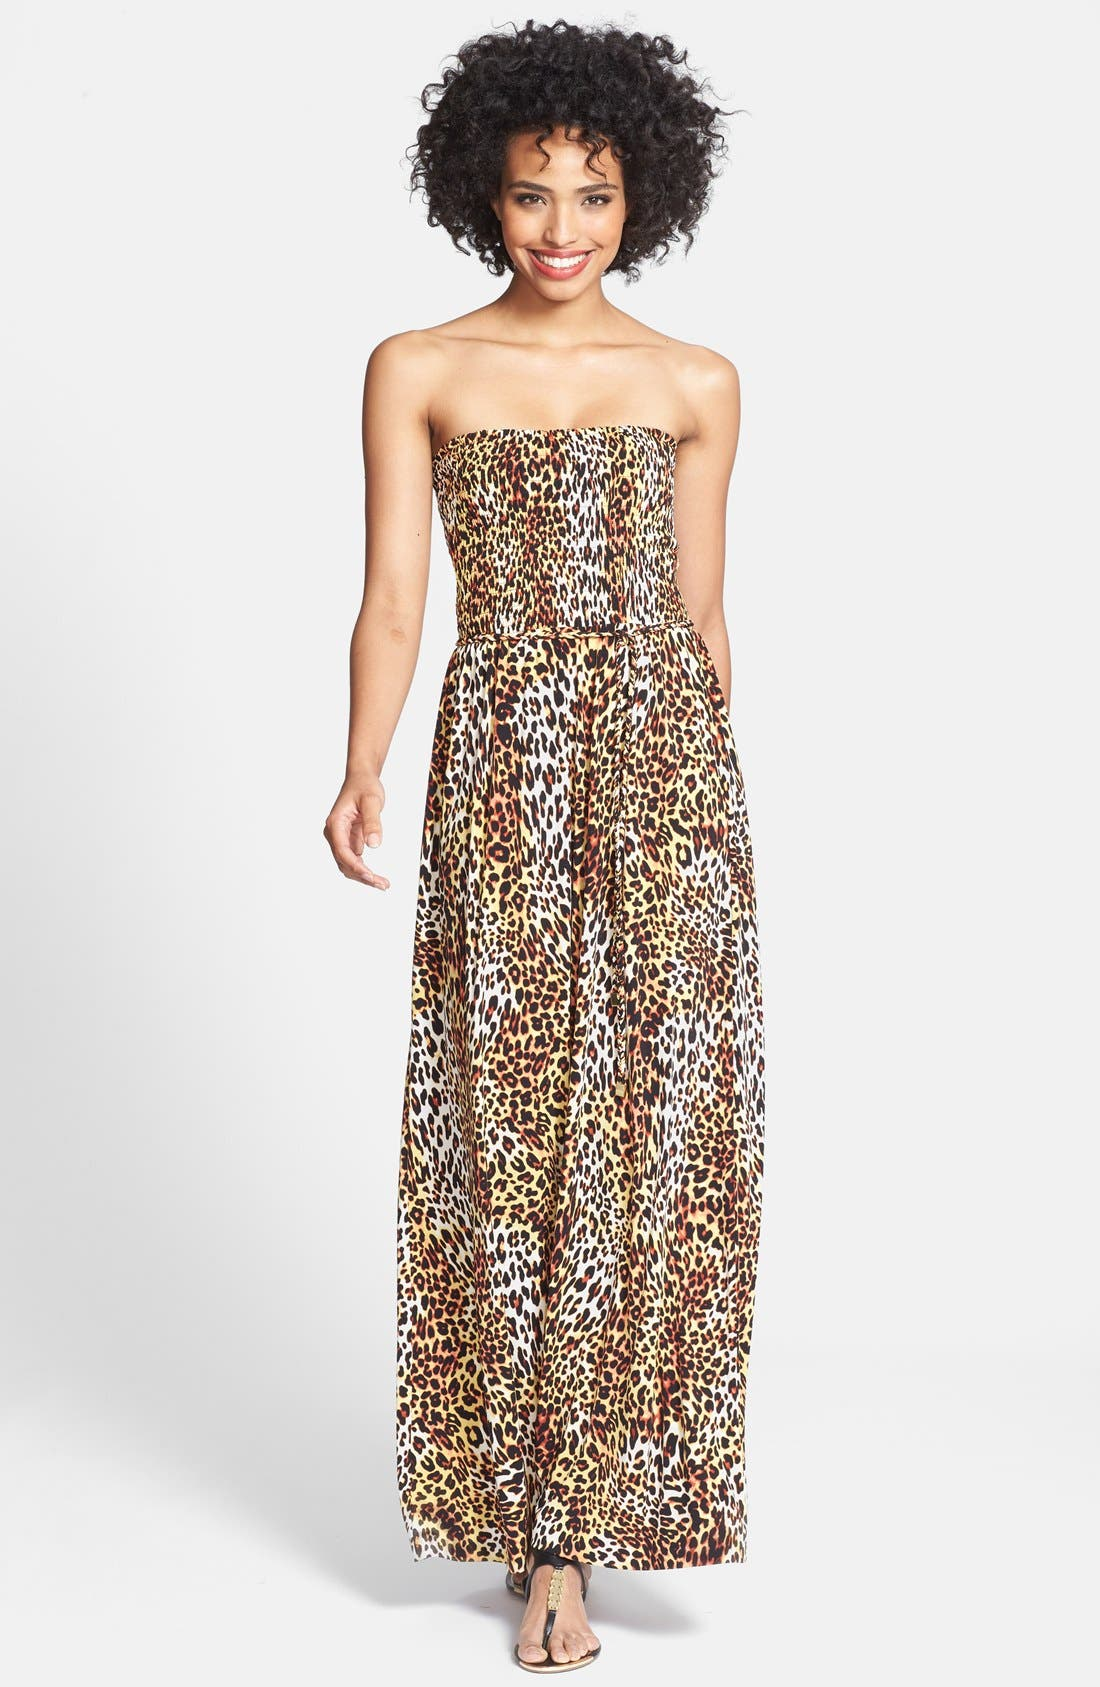 Alternate Image 1 Selected - Anne Klein Leopard Print Strapless Maxi Dress (Regular & Petite)